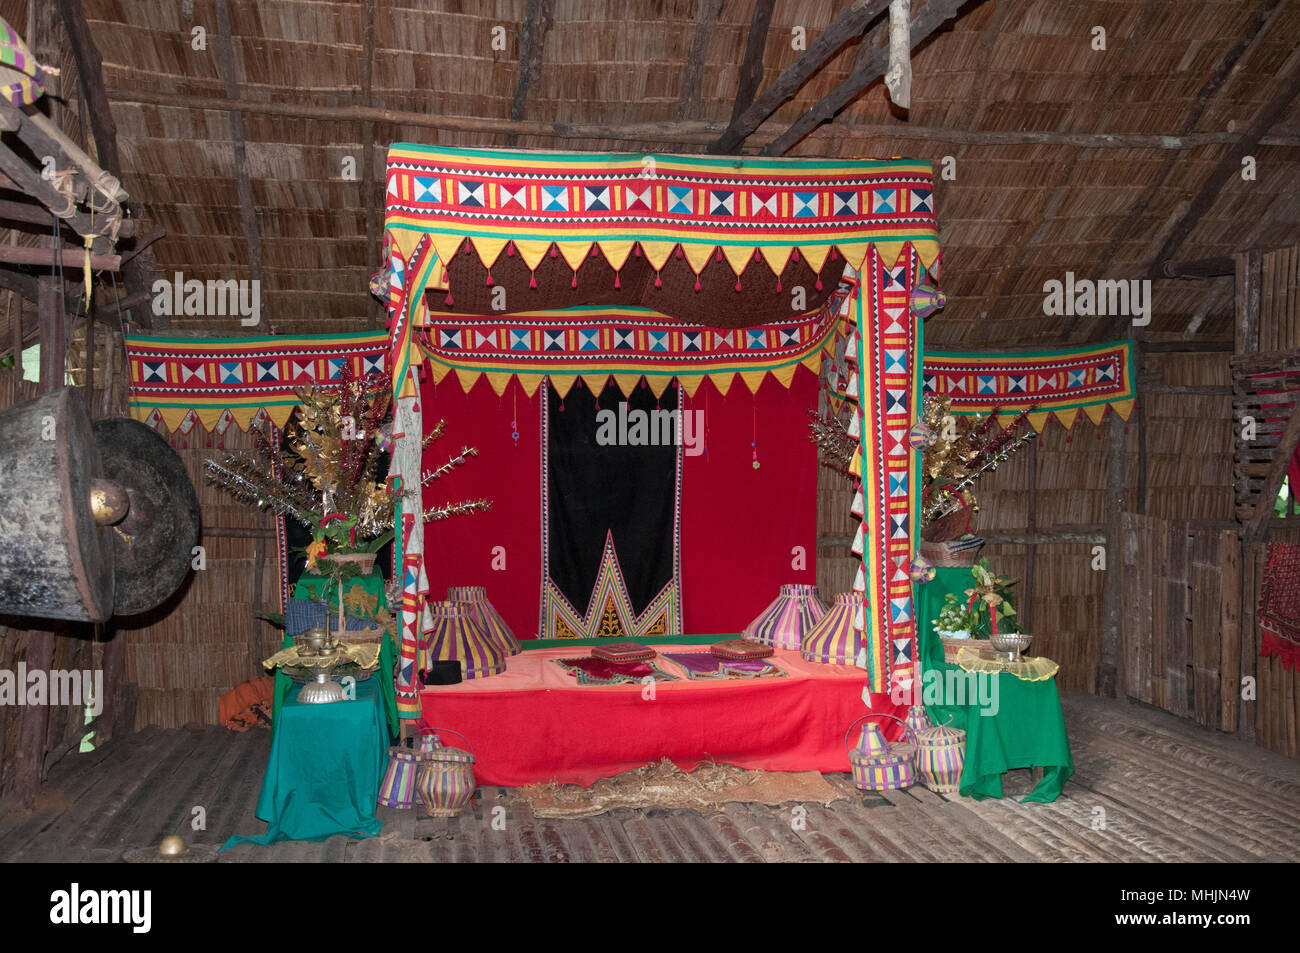 Wedding chamber at a Bajau House at the Mari Mari Cultural Village, Kota Kinabalu, Sabah, Malaysian Borneo - Stock Image